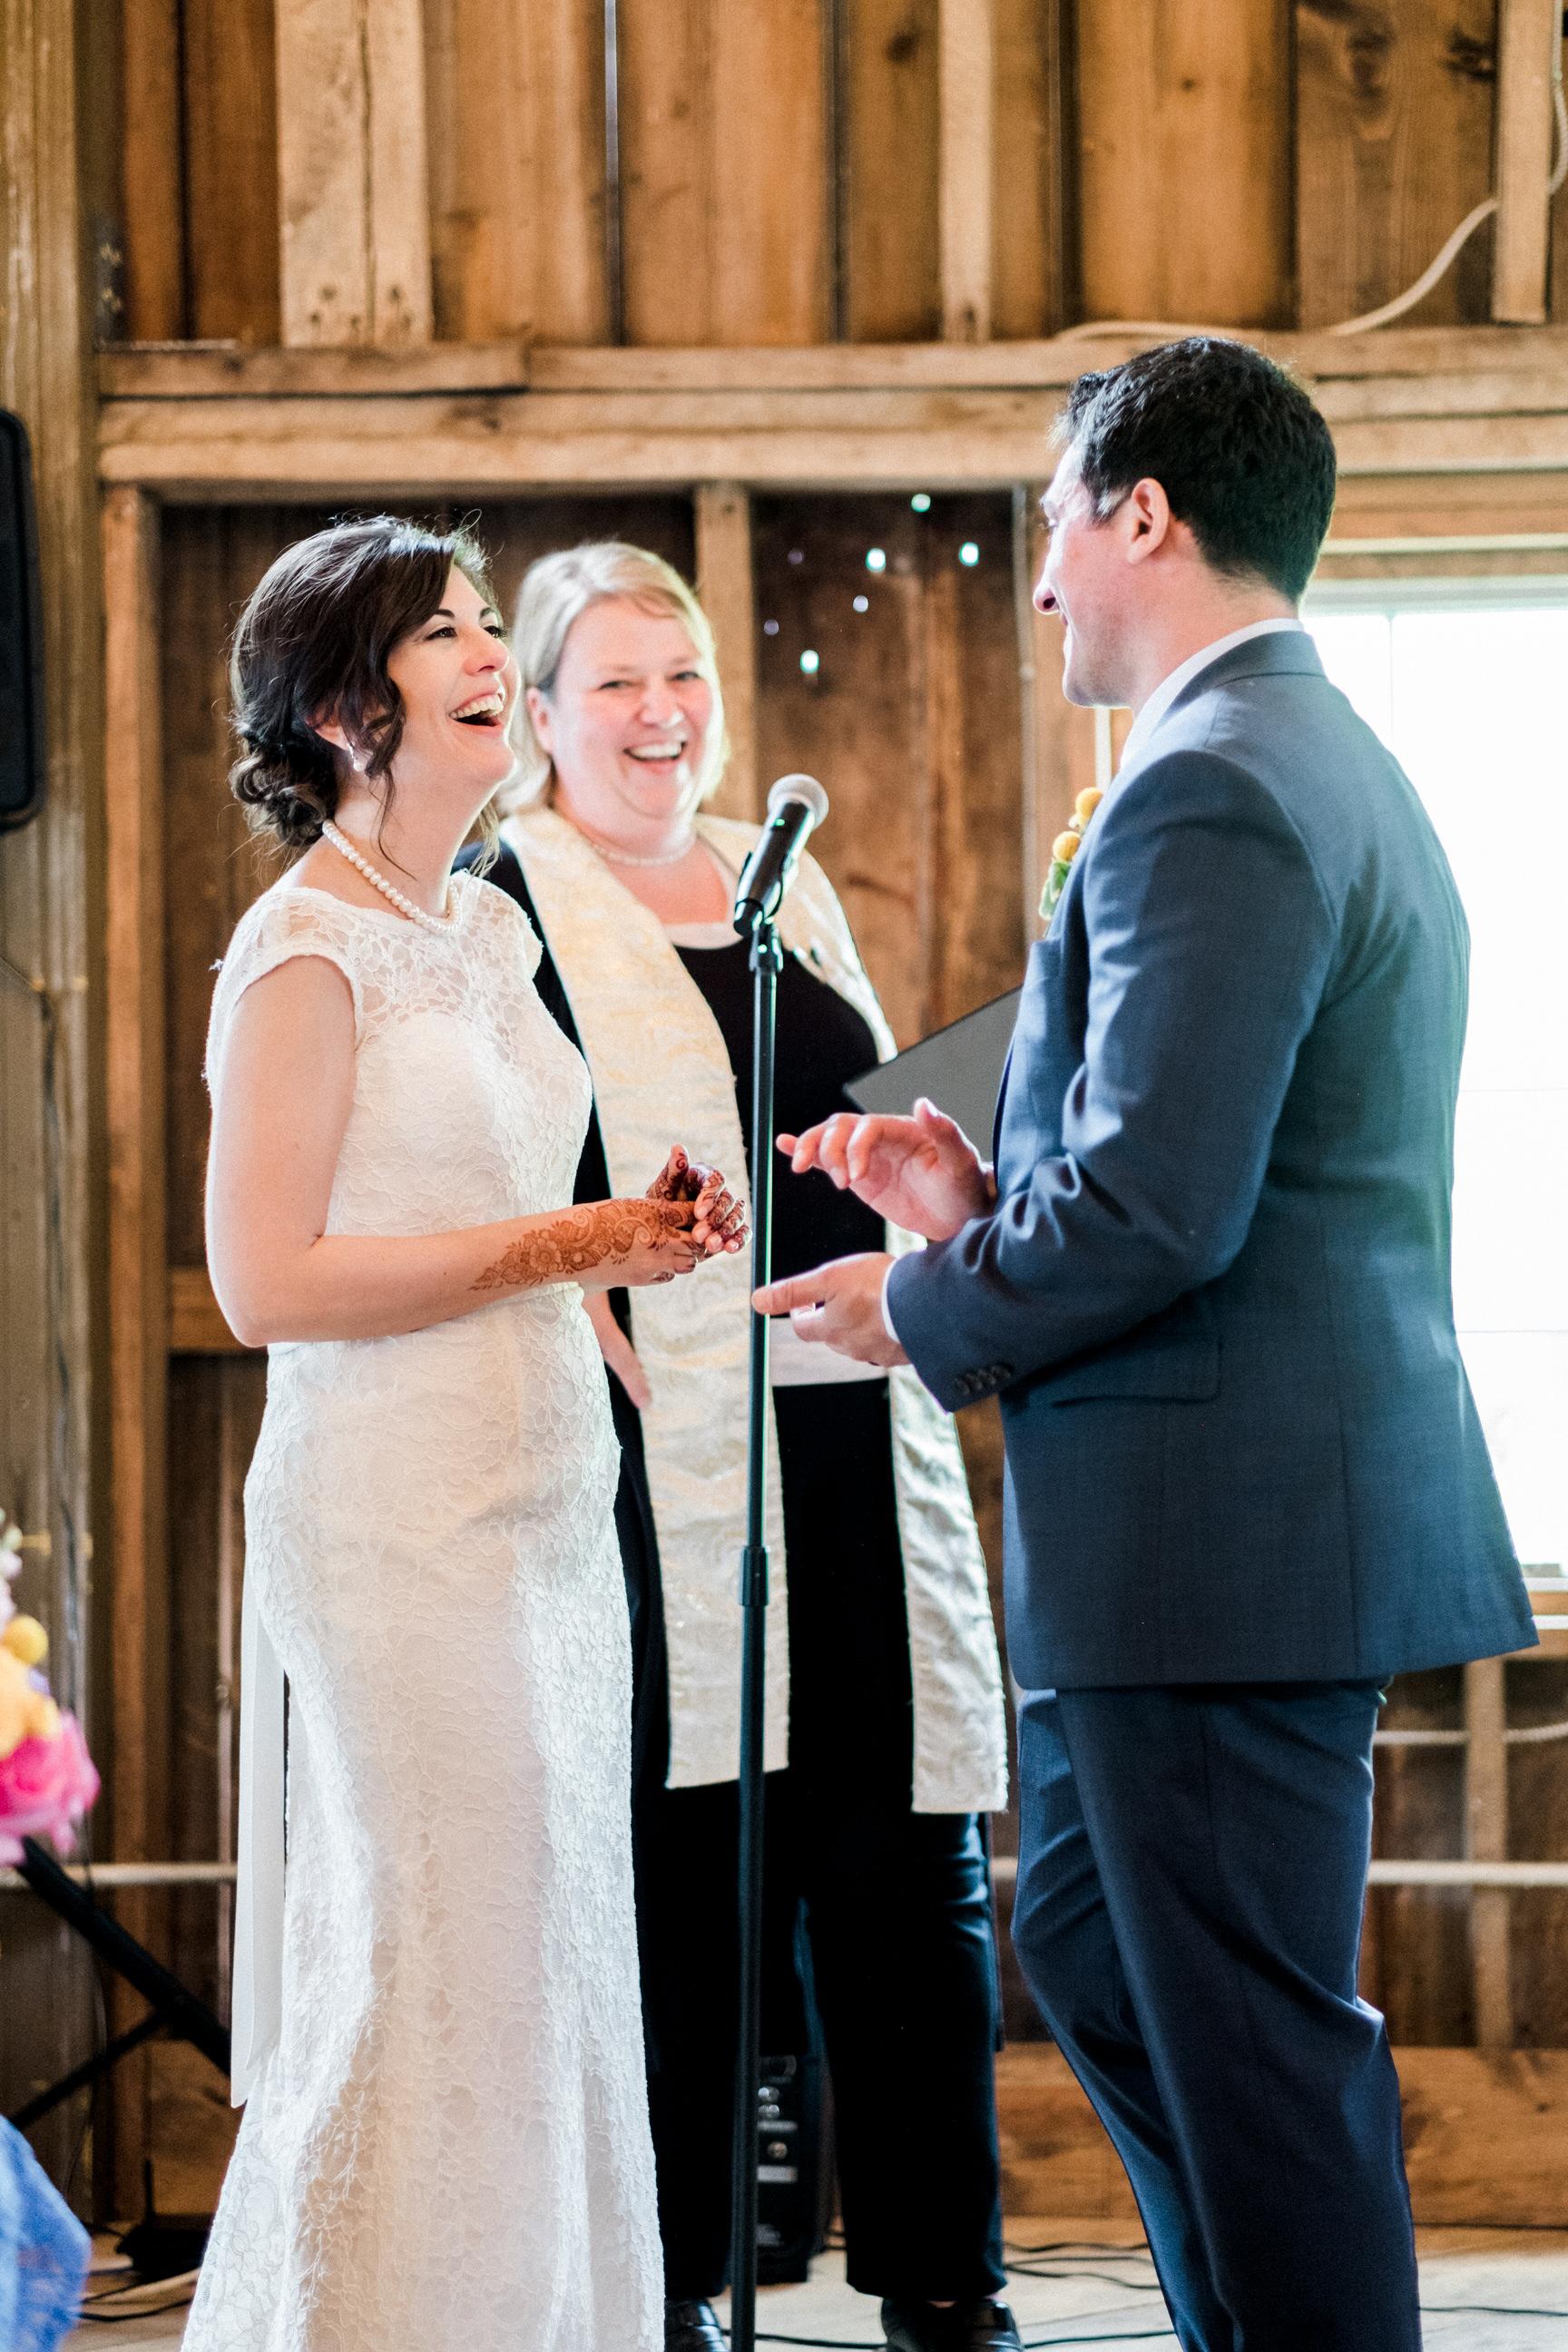 Minnesota Barn wedding photographer at Bloom Lake Barn in Shafer, MN